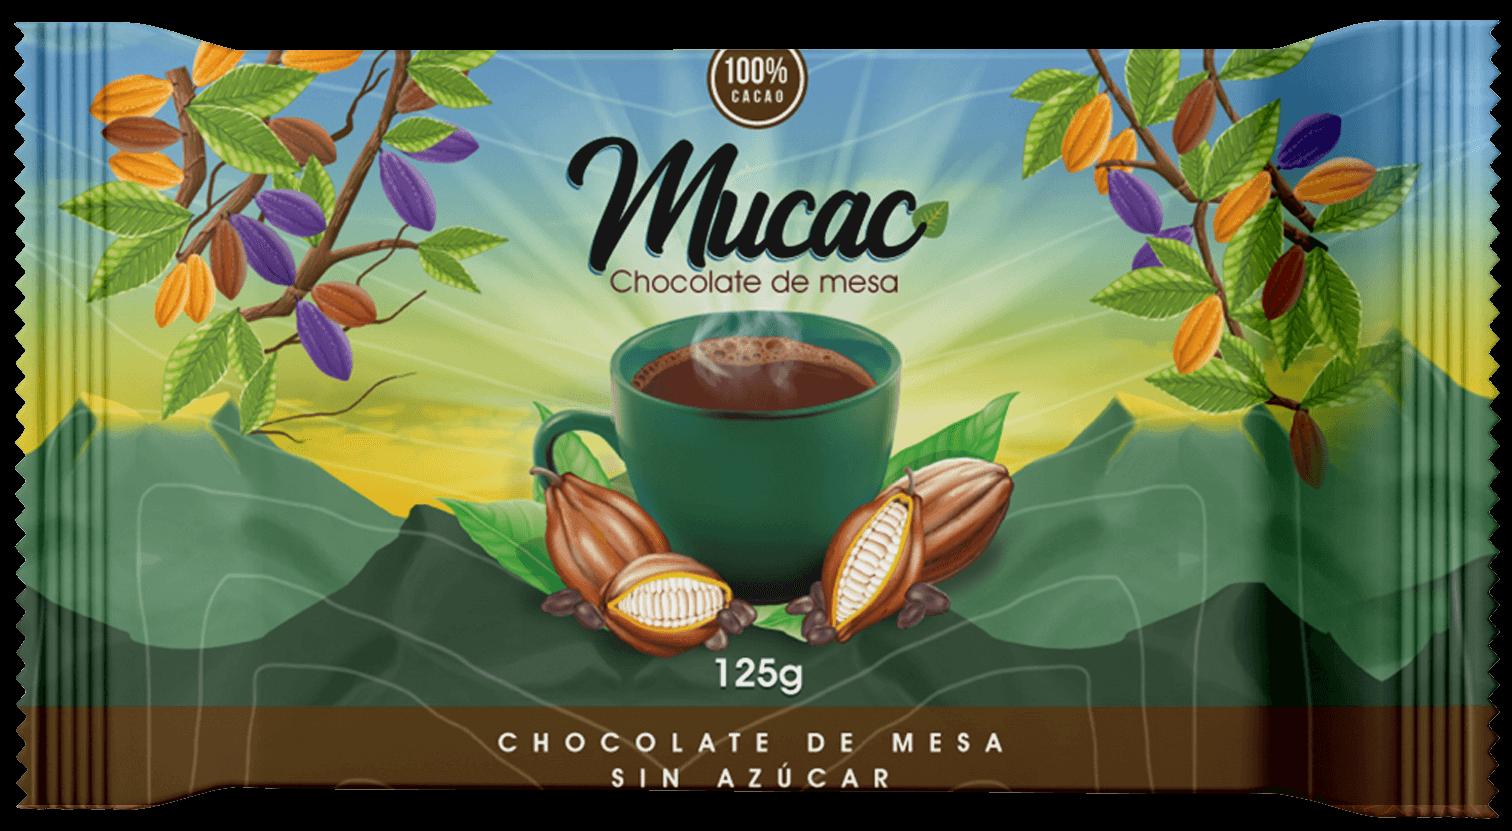 Chocolate-de-Mesa-Mucac-Fedecacao.png